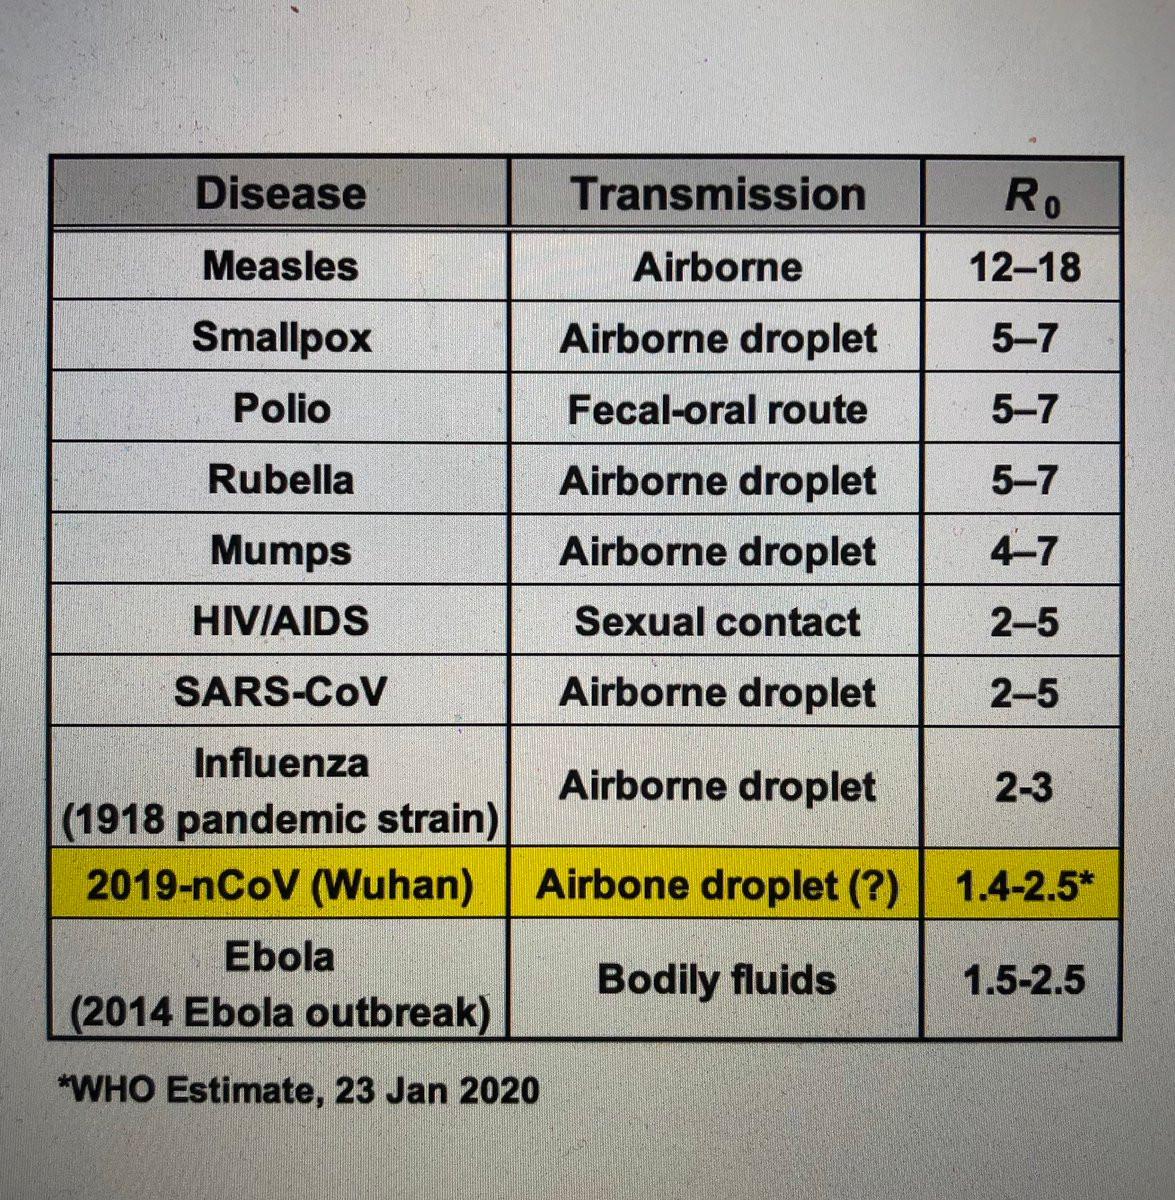 Koronavirus in podobne bolezni